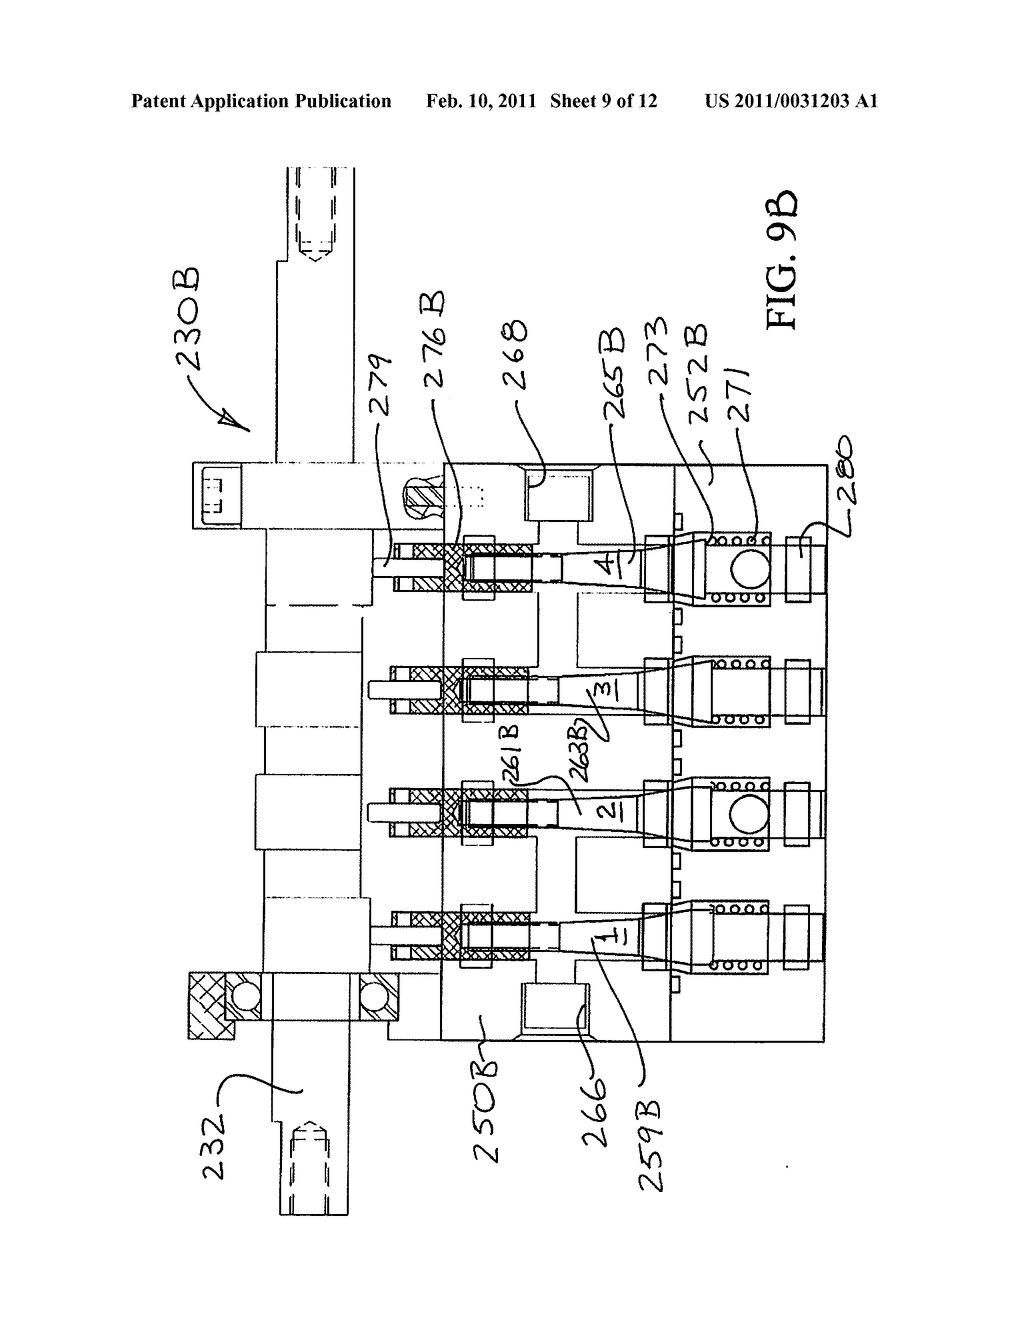 elec wiring diagram for mubea ironworker , 2012 vw golf fuse box diagram  , 1978 mercedes 300cd fuse box , diagram oven kenmore wiring 363 9378810